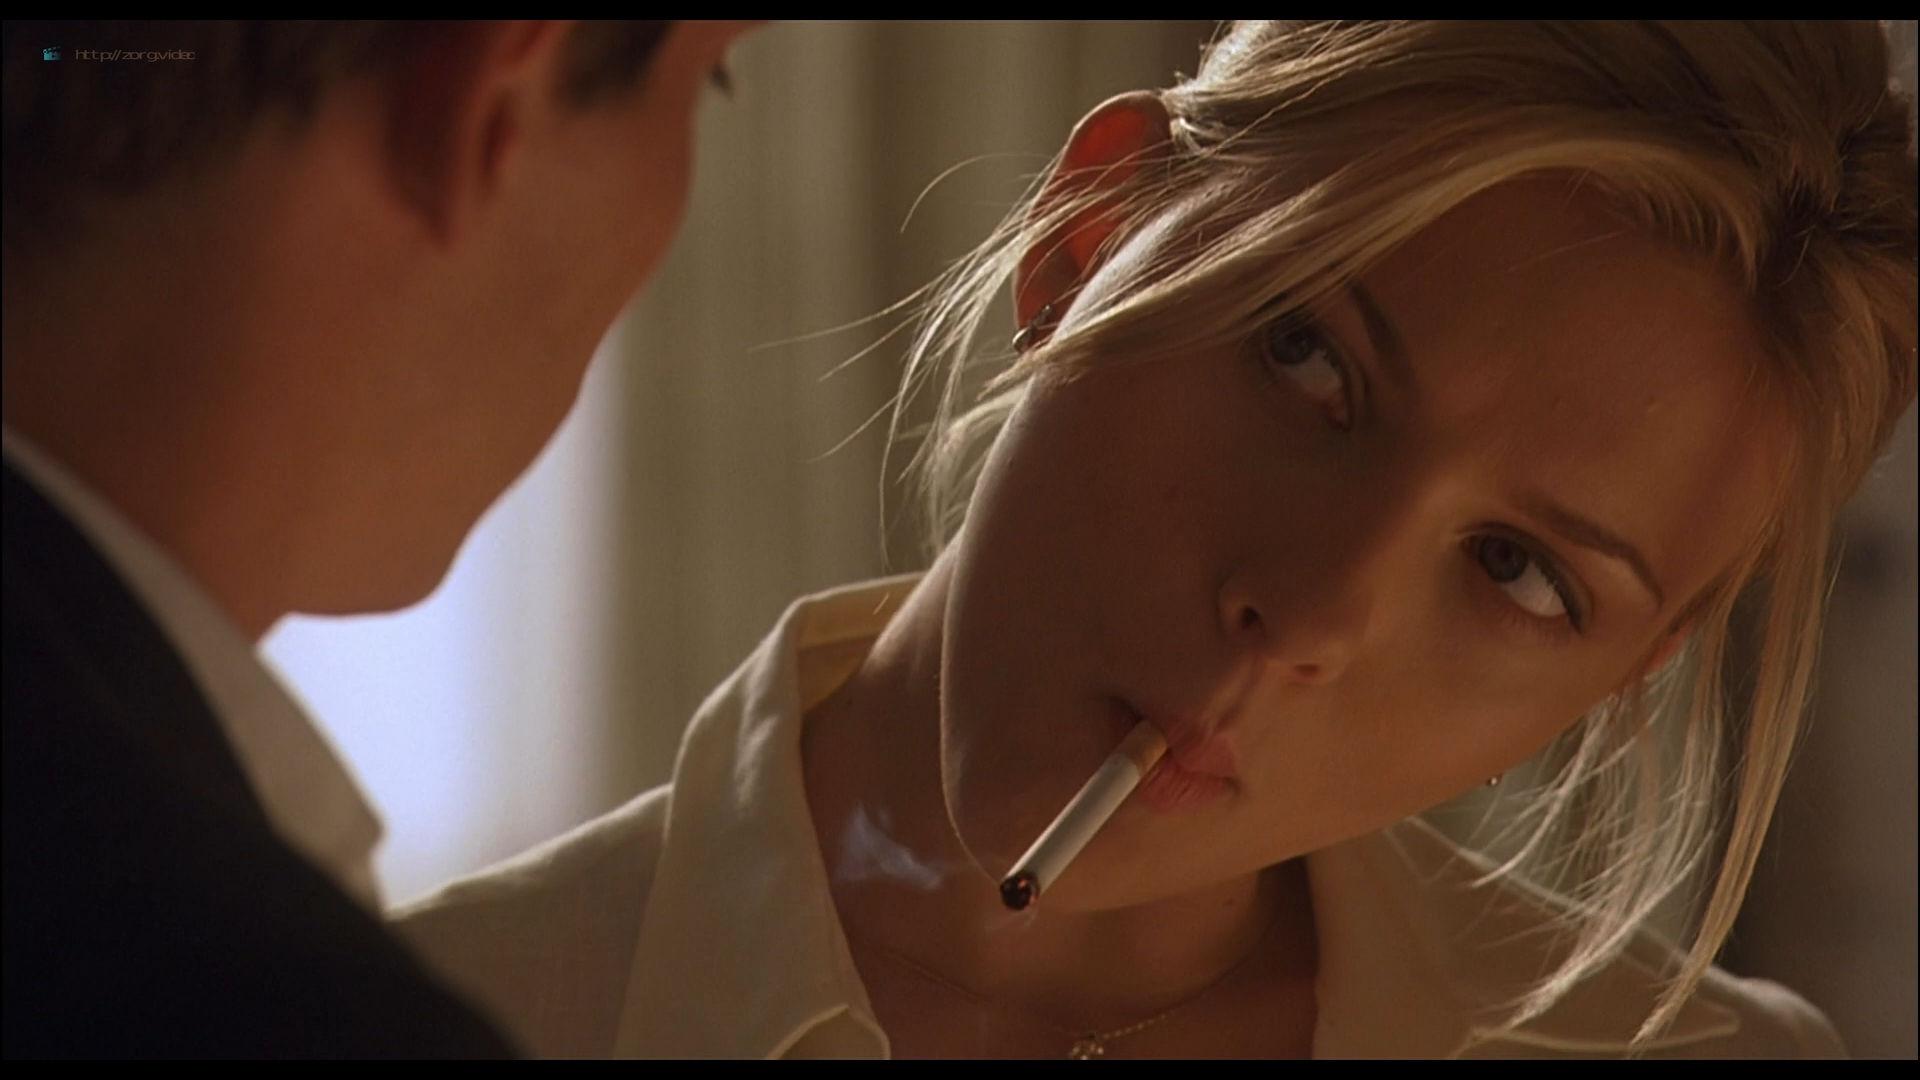 Scarlett Johansson see through and sex - Match Point (2005) HD 1080p BluRay (18)